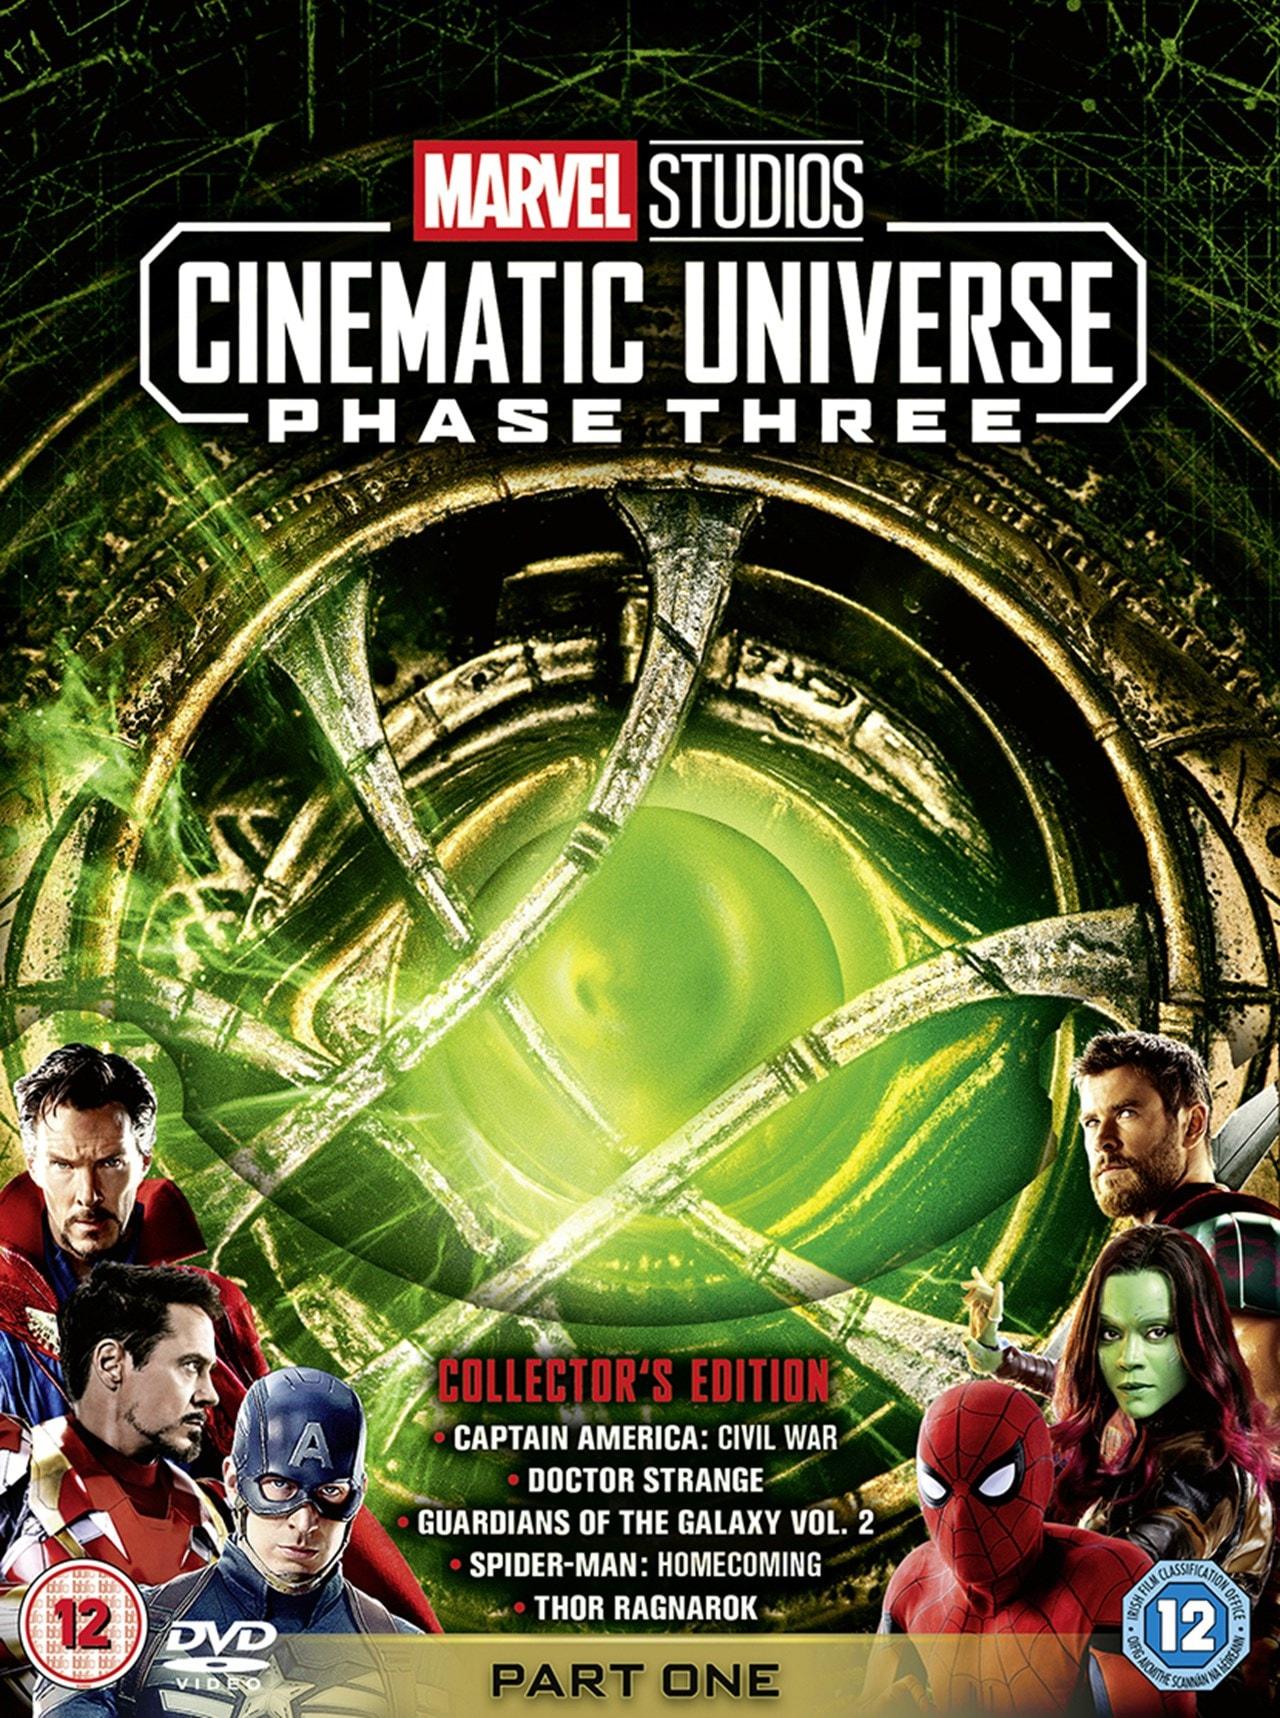 Marvel Studios Cinematic Universe Phase Three Part One Dvd Box Set Free Shipping Over 20 Hmv Store